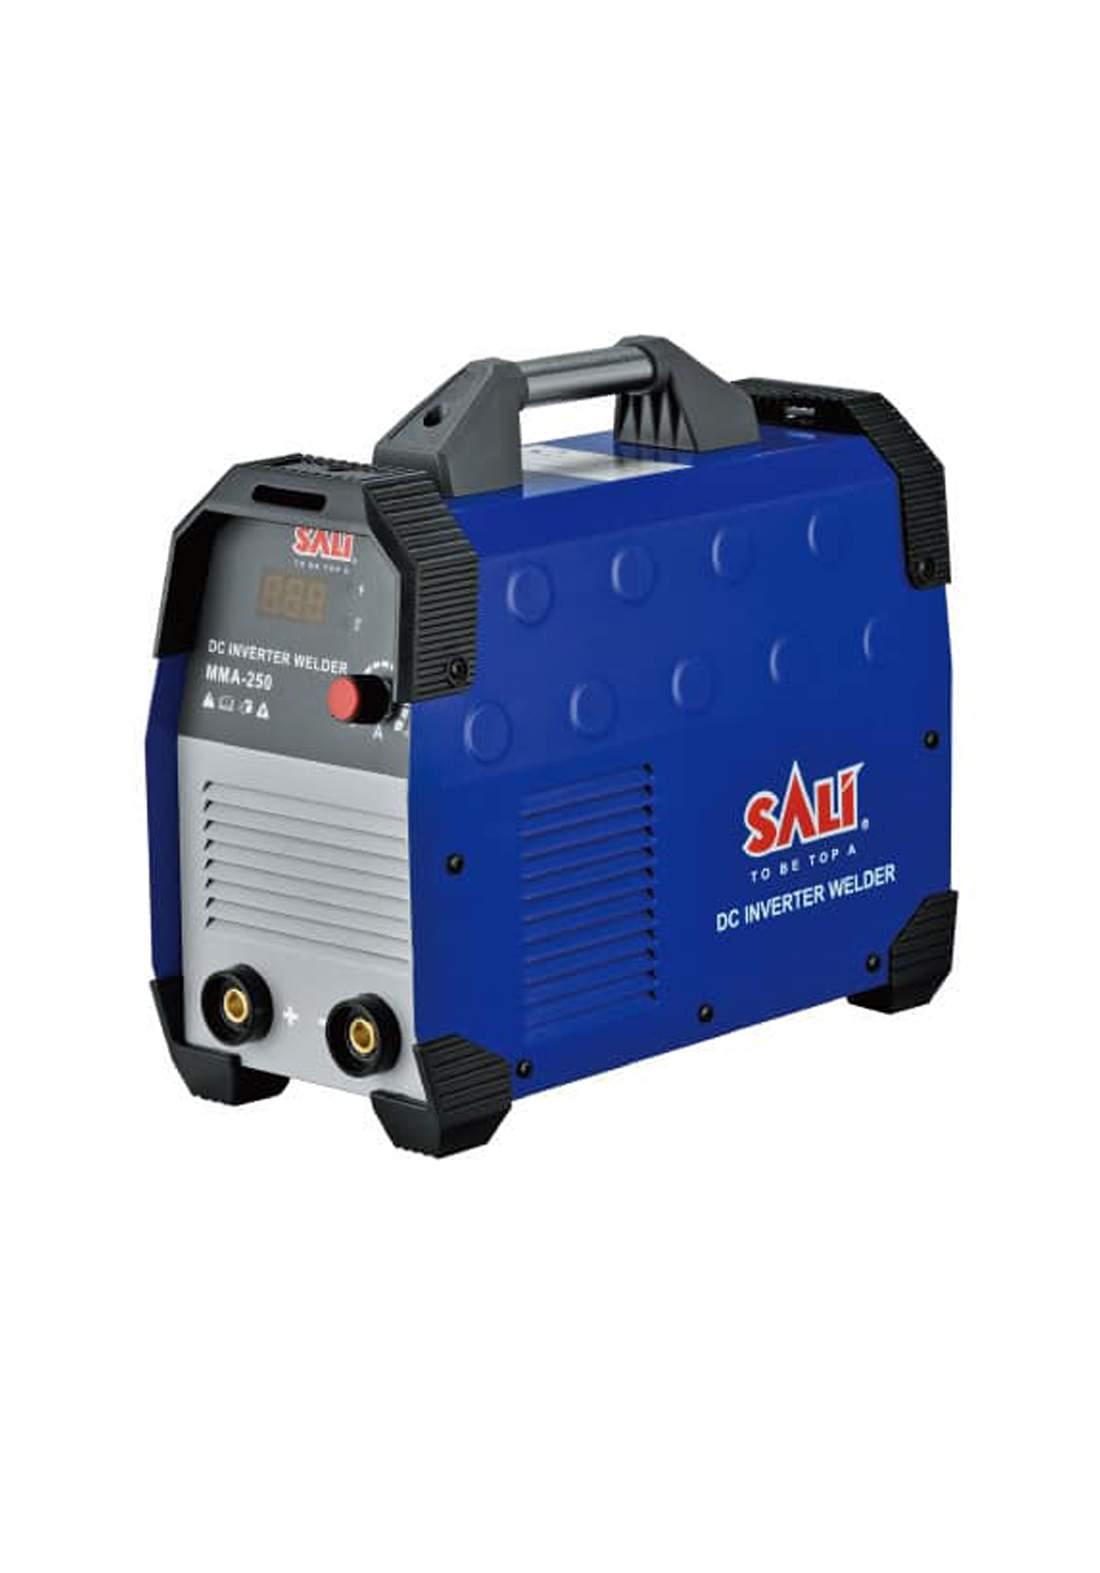 Sali W020225A Reversible Electric Welding Machine ماكنة لحام كهربائية عكسية